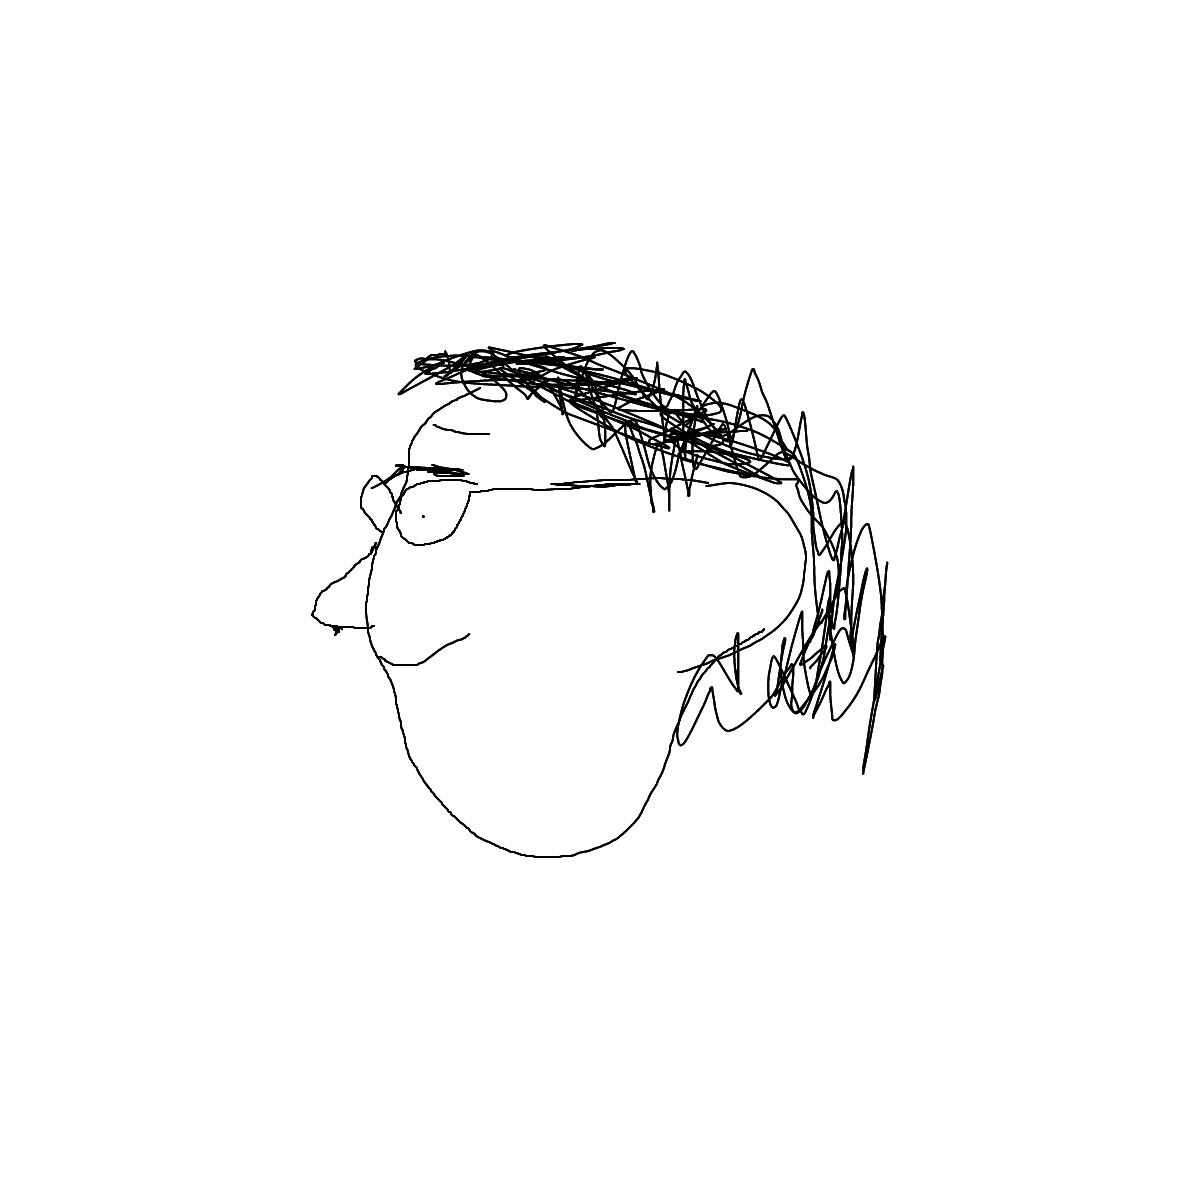 BAAAM drawing#17325 lat:51.2067413330078100lng: 3.2589907646179200